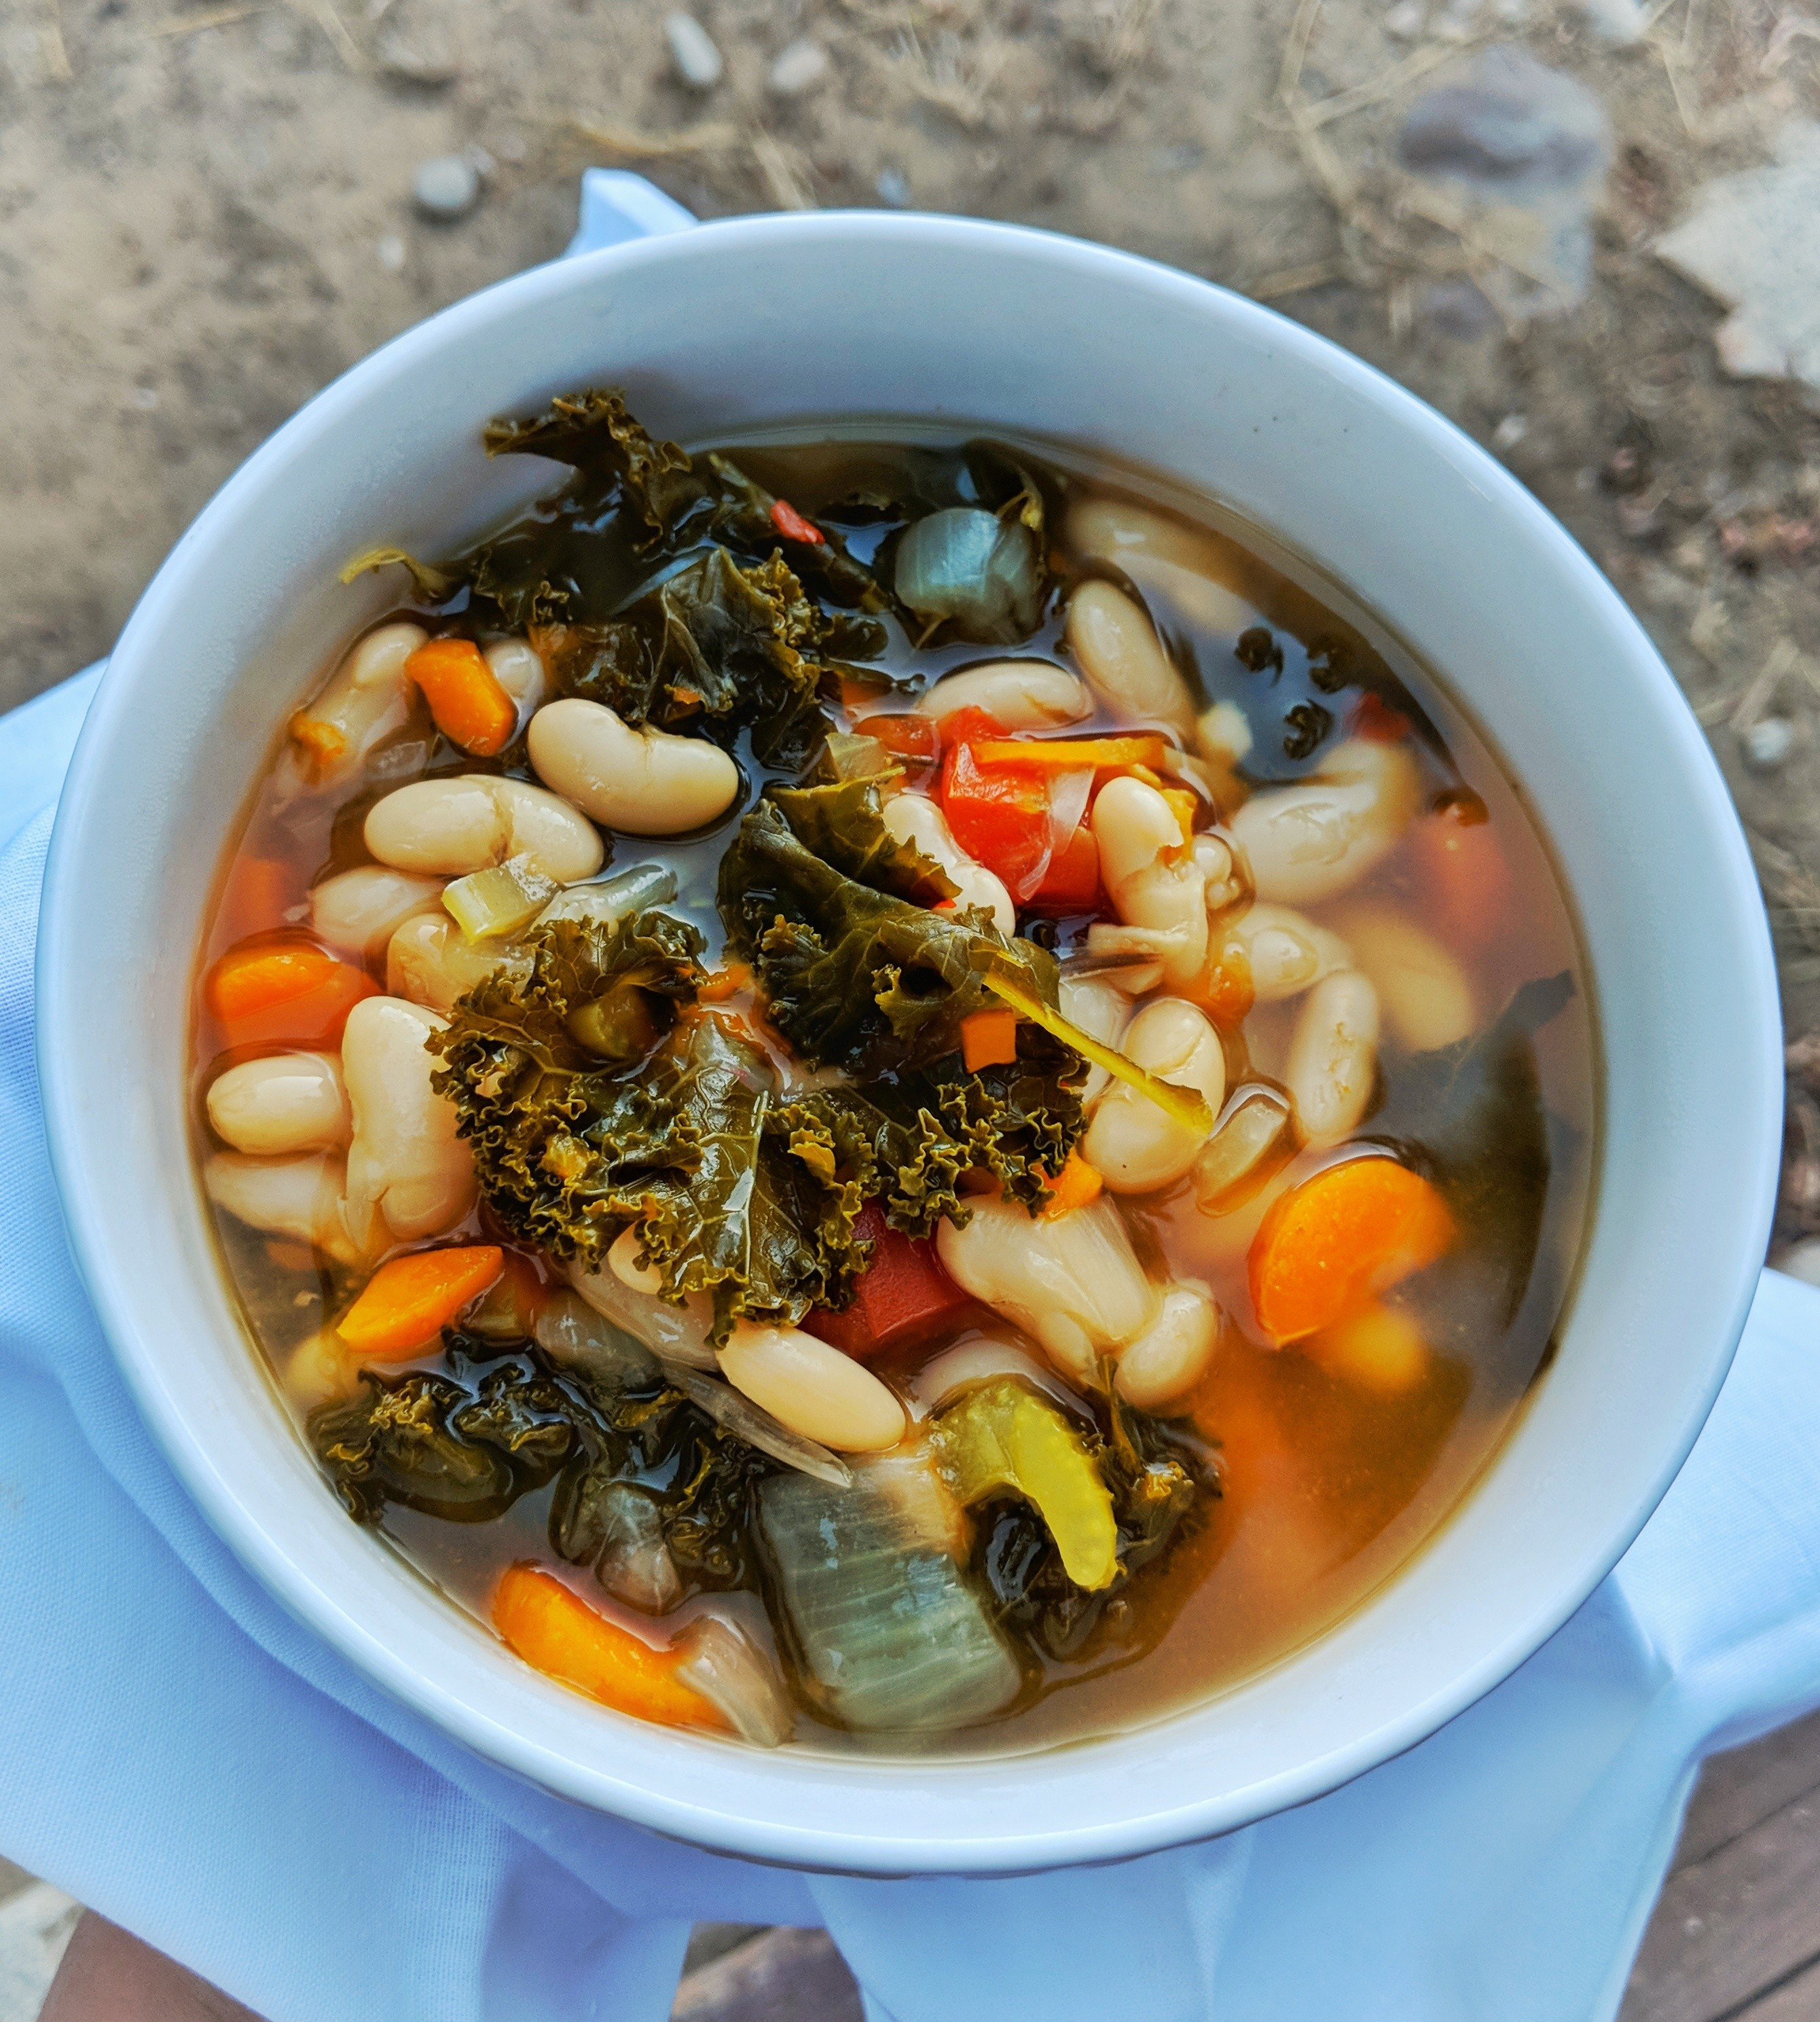 Vegan Instant Pot White Bean and Kale Soup